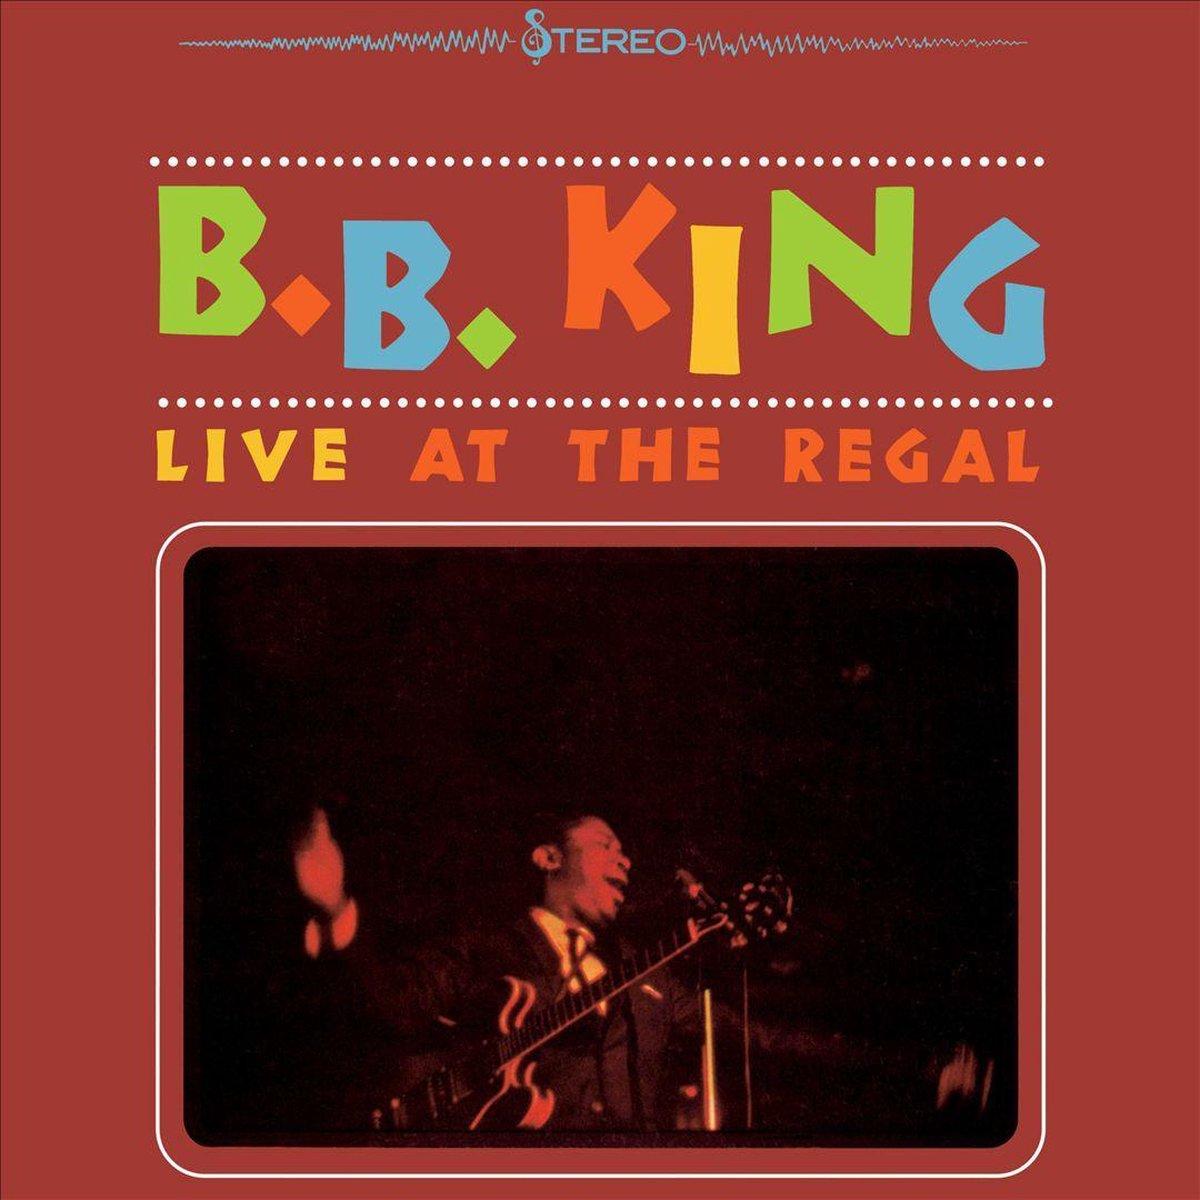 Live at the Regal (LP) - B.B. King